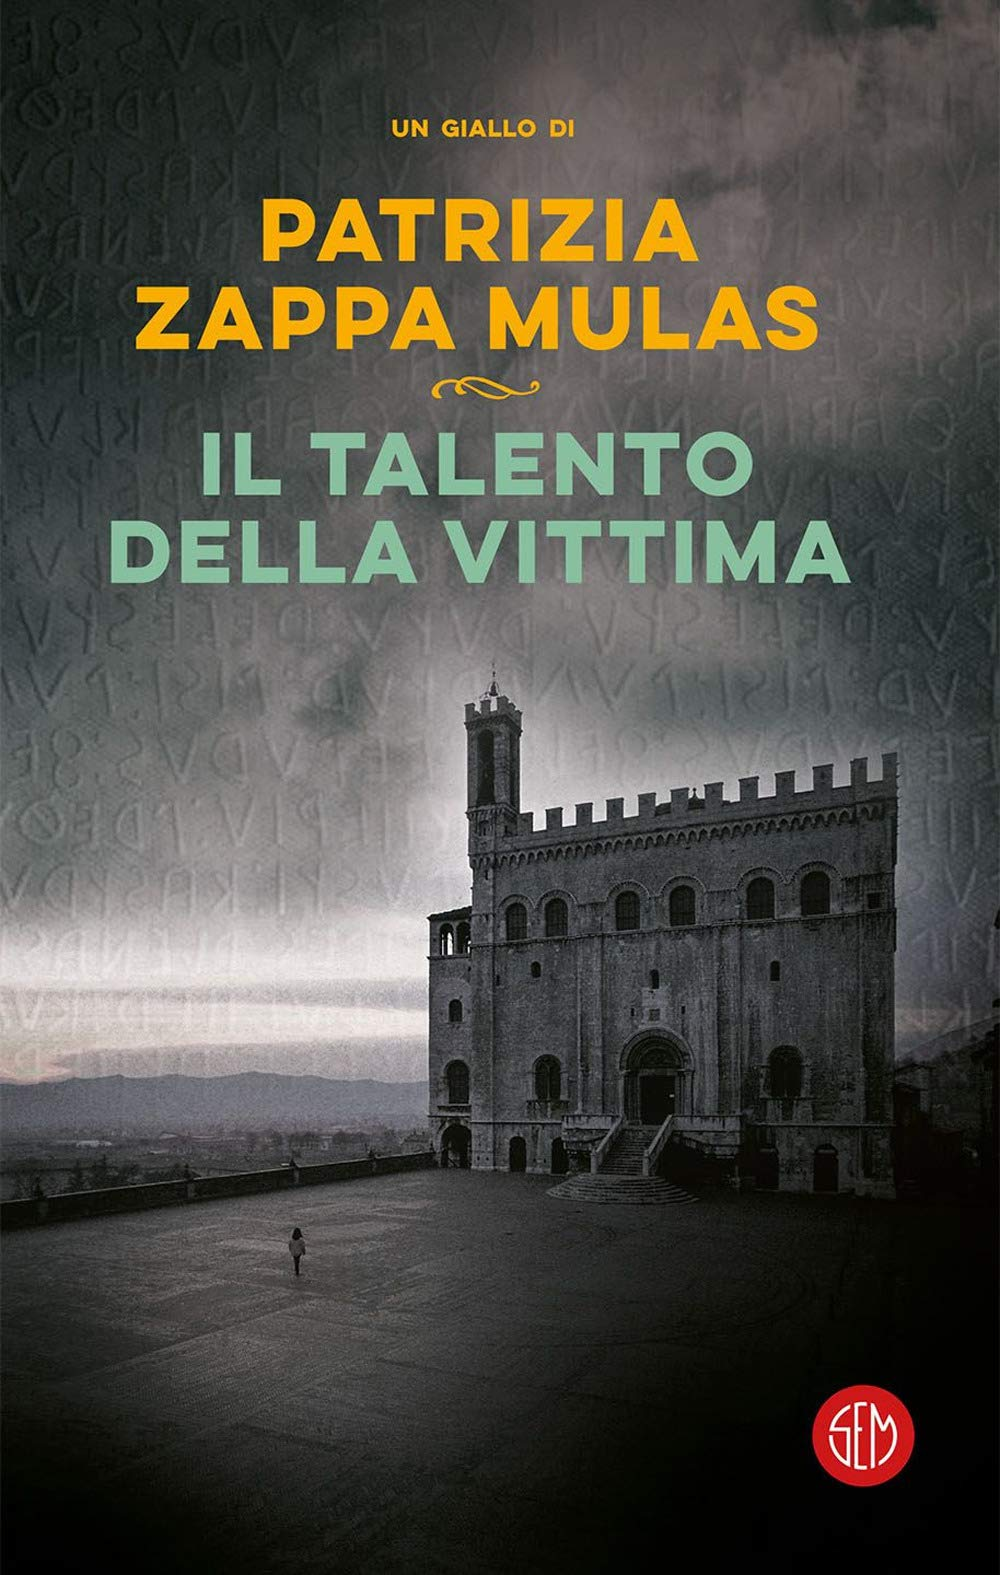 Patrizia Zappa Mulas